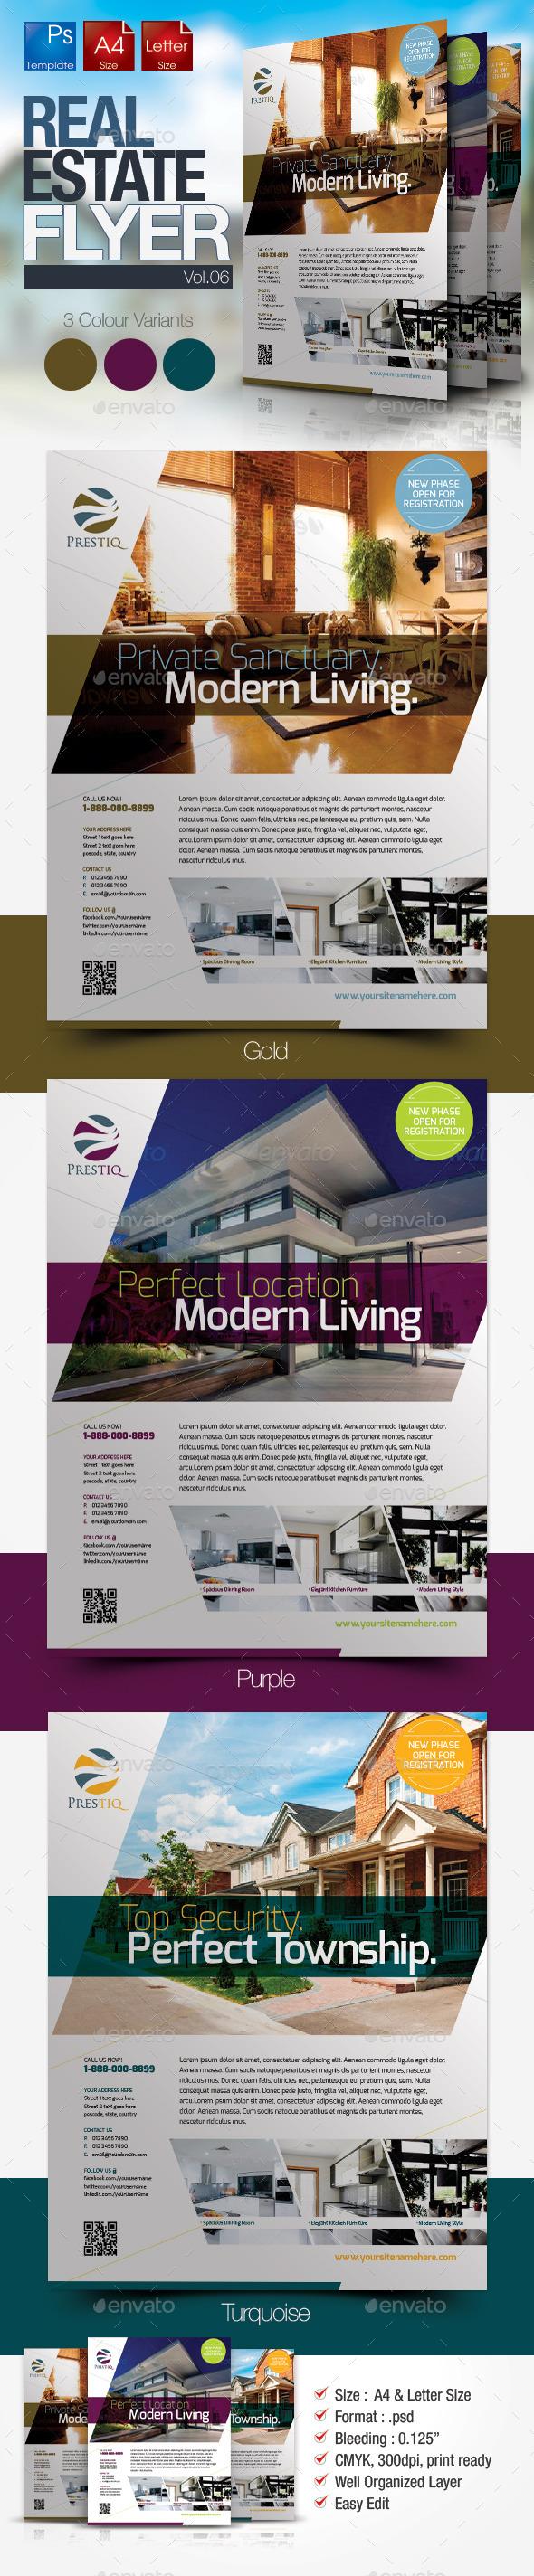 GraphicRiver Simple Real Estate Flyer Vol.06 10054058